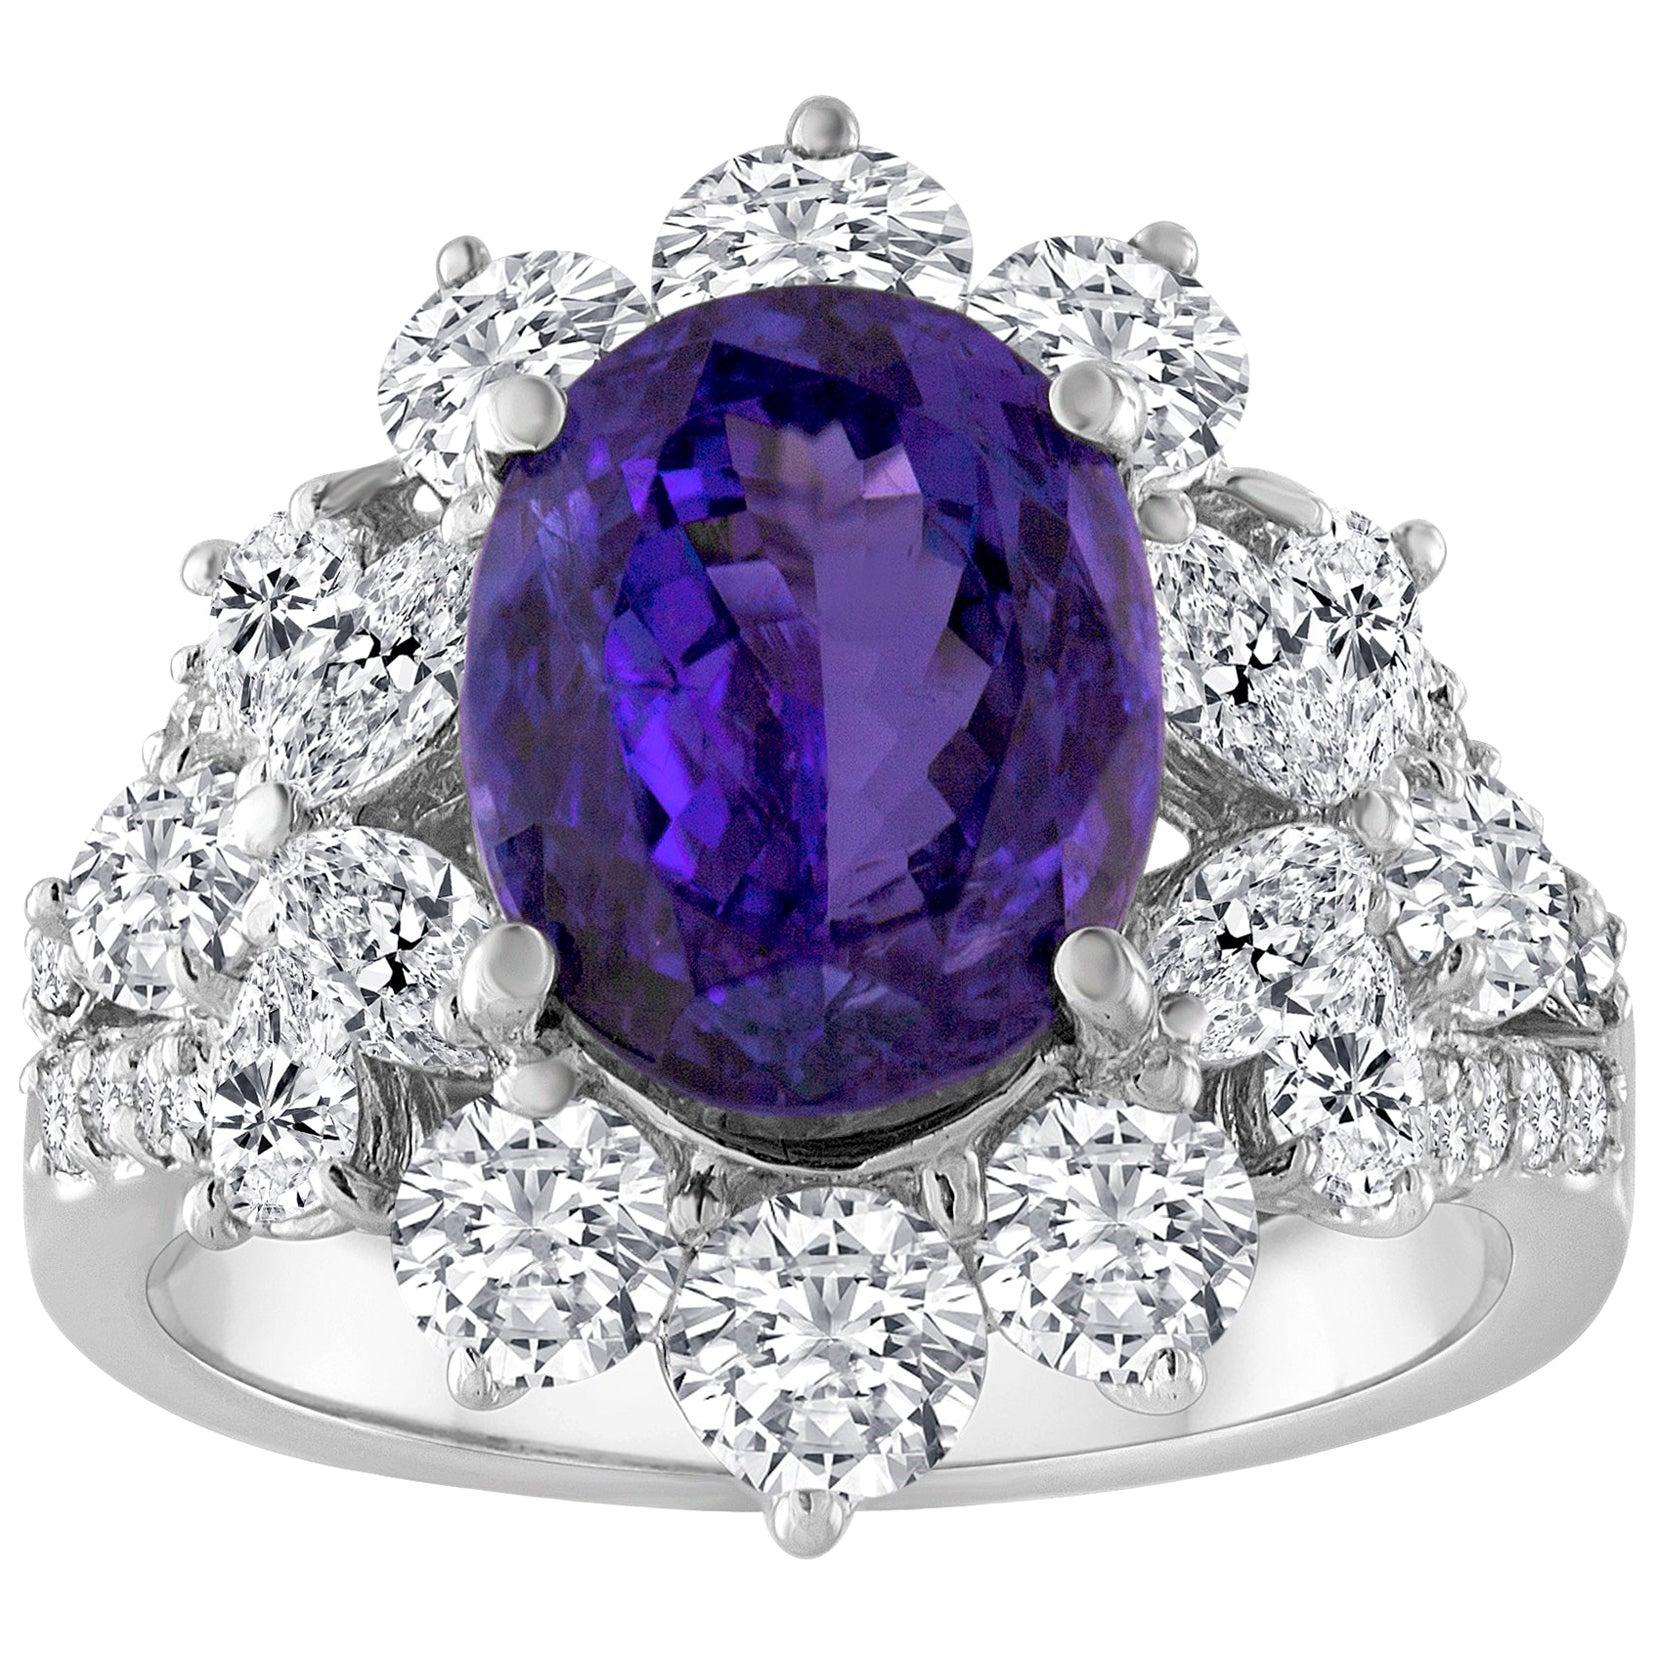 4.10 Carat Oval Tanzanite Diamond Gold Ring